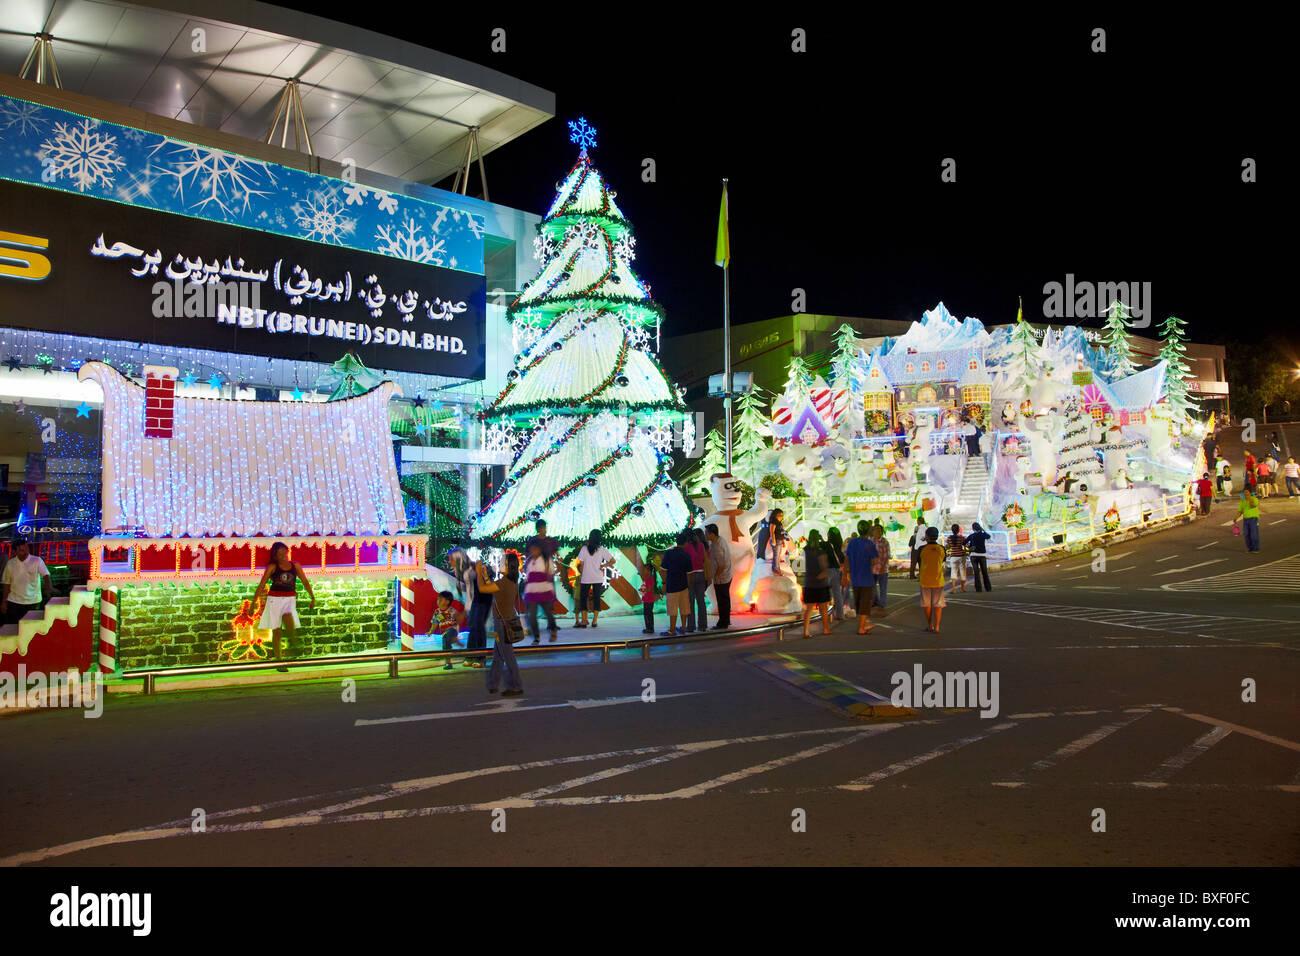 Christmas Decorations at the Lexus Dealership, Bandar Seri Begawan, Brunei Darussalam, Asia - Stock Image